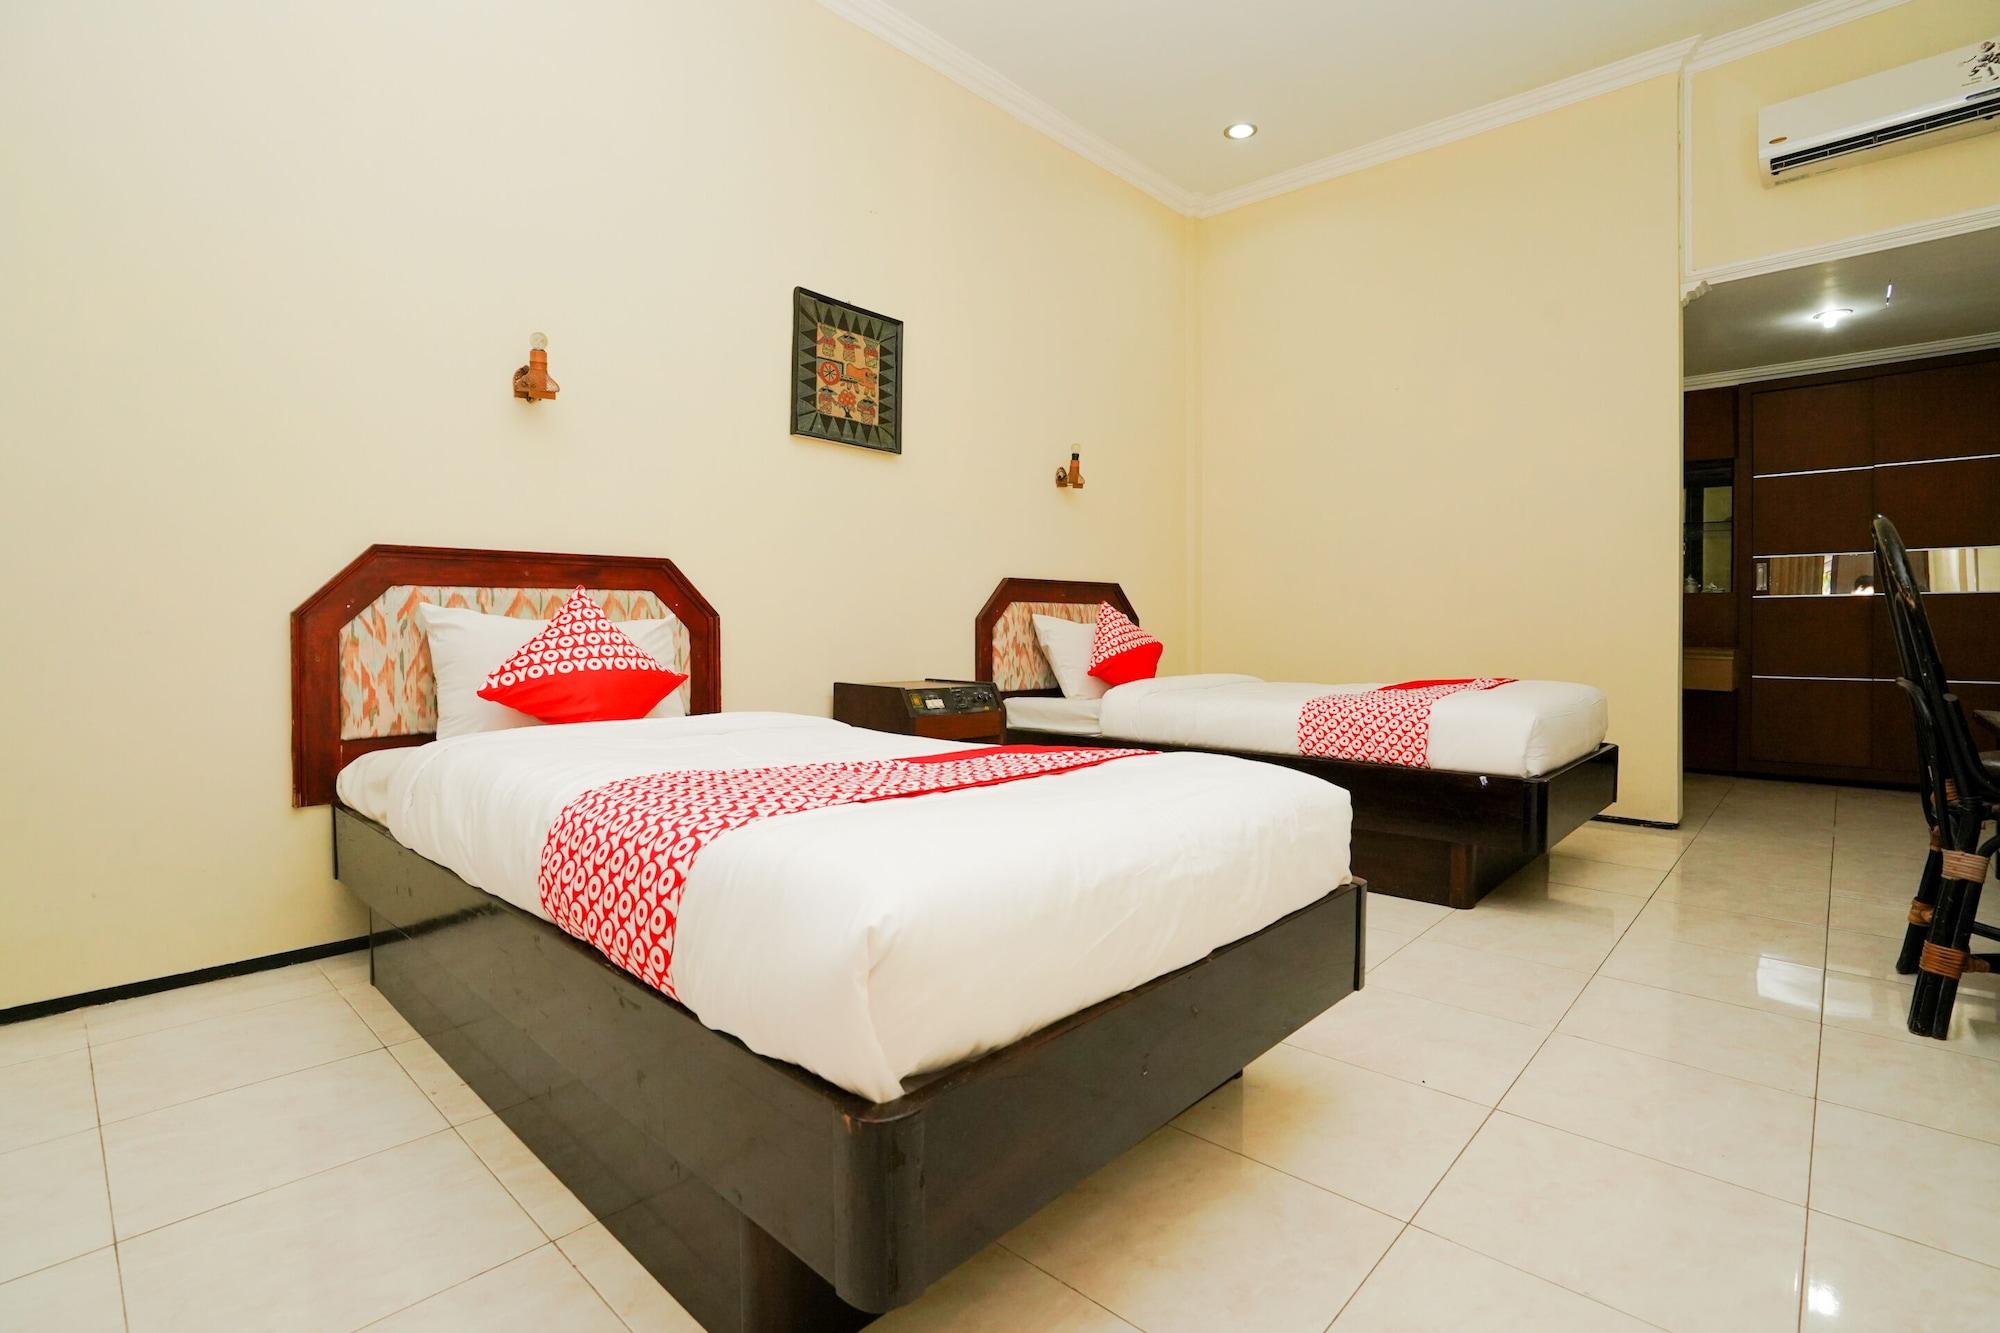 OYO 1652 Hotel Tampiarto, Probolinggo